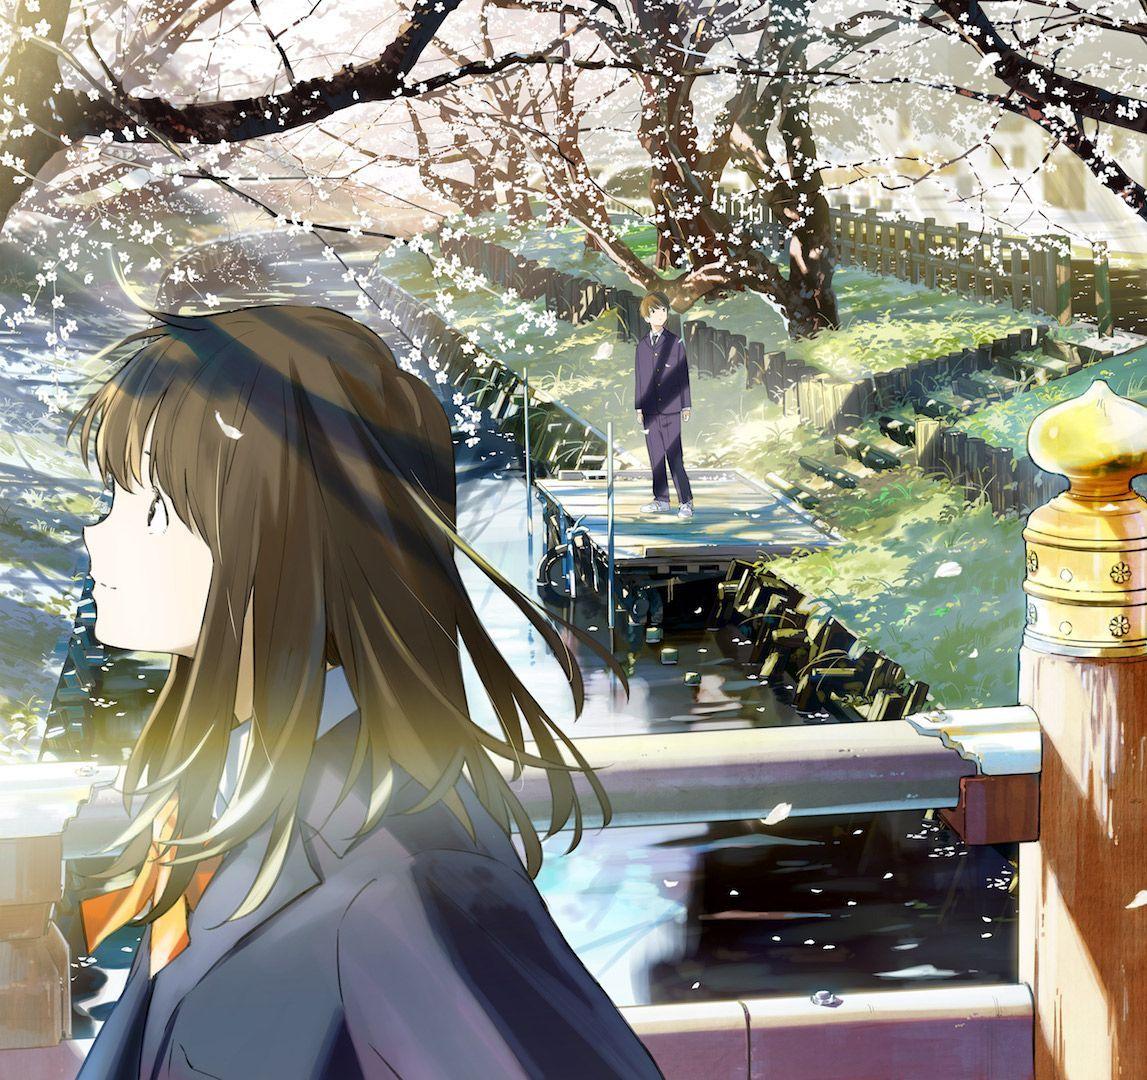 Tsuki ga Kirei (The Moon is Beautiful)